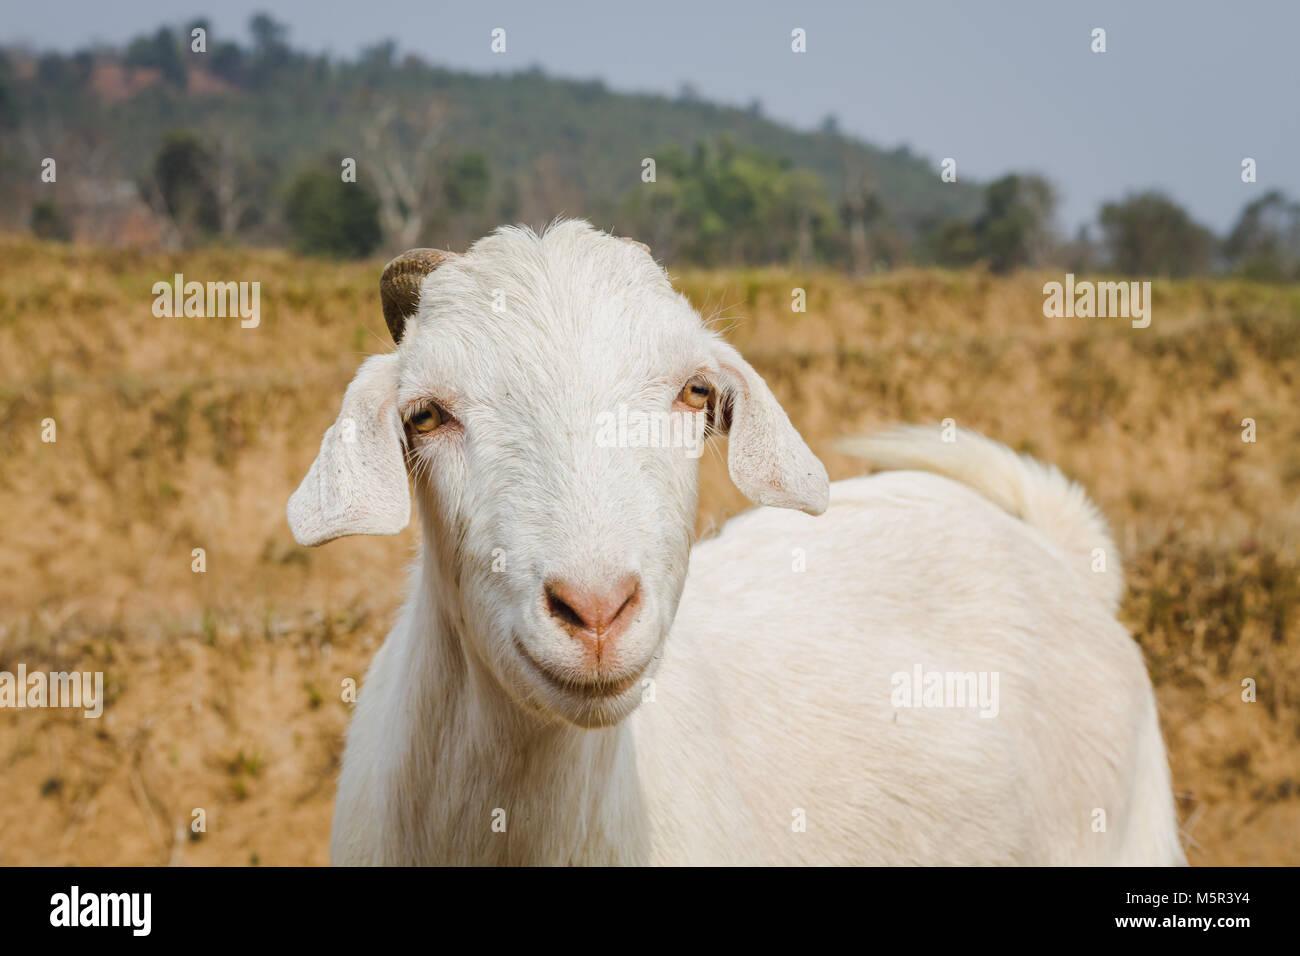 Himalayan goat looking at the Camera - Stock Image